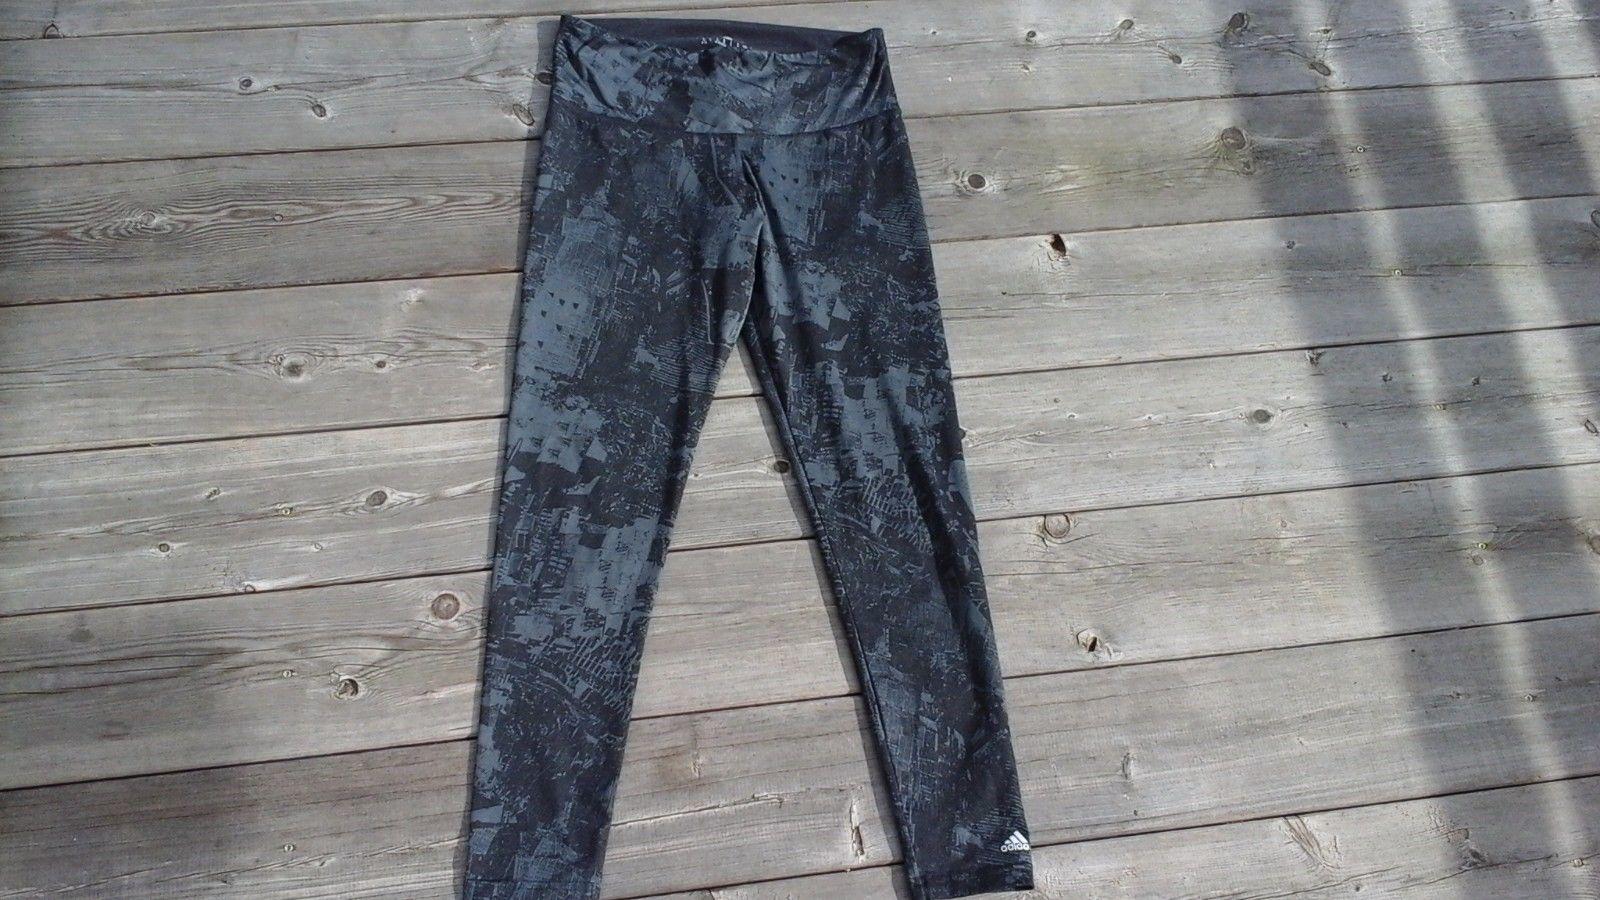 Laufhose von ADIDAS Sporthose Leggings climate S 36 38 fast NEU schwarz grau